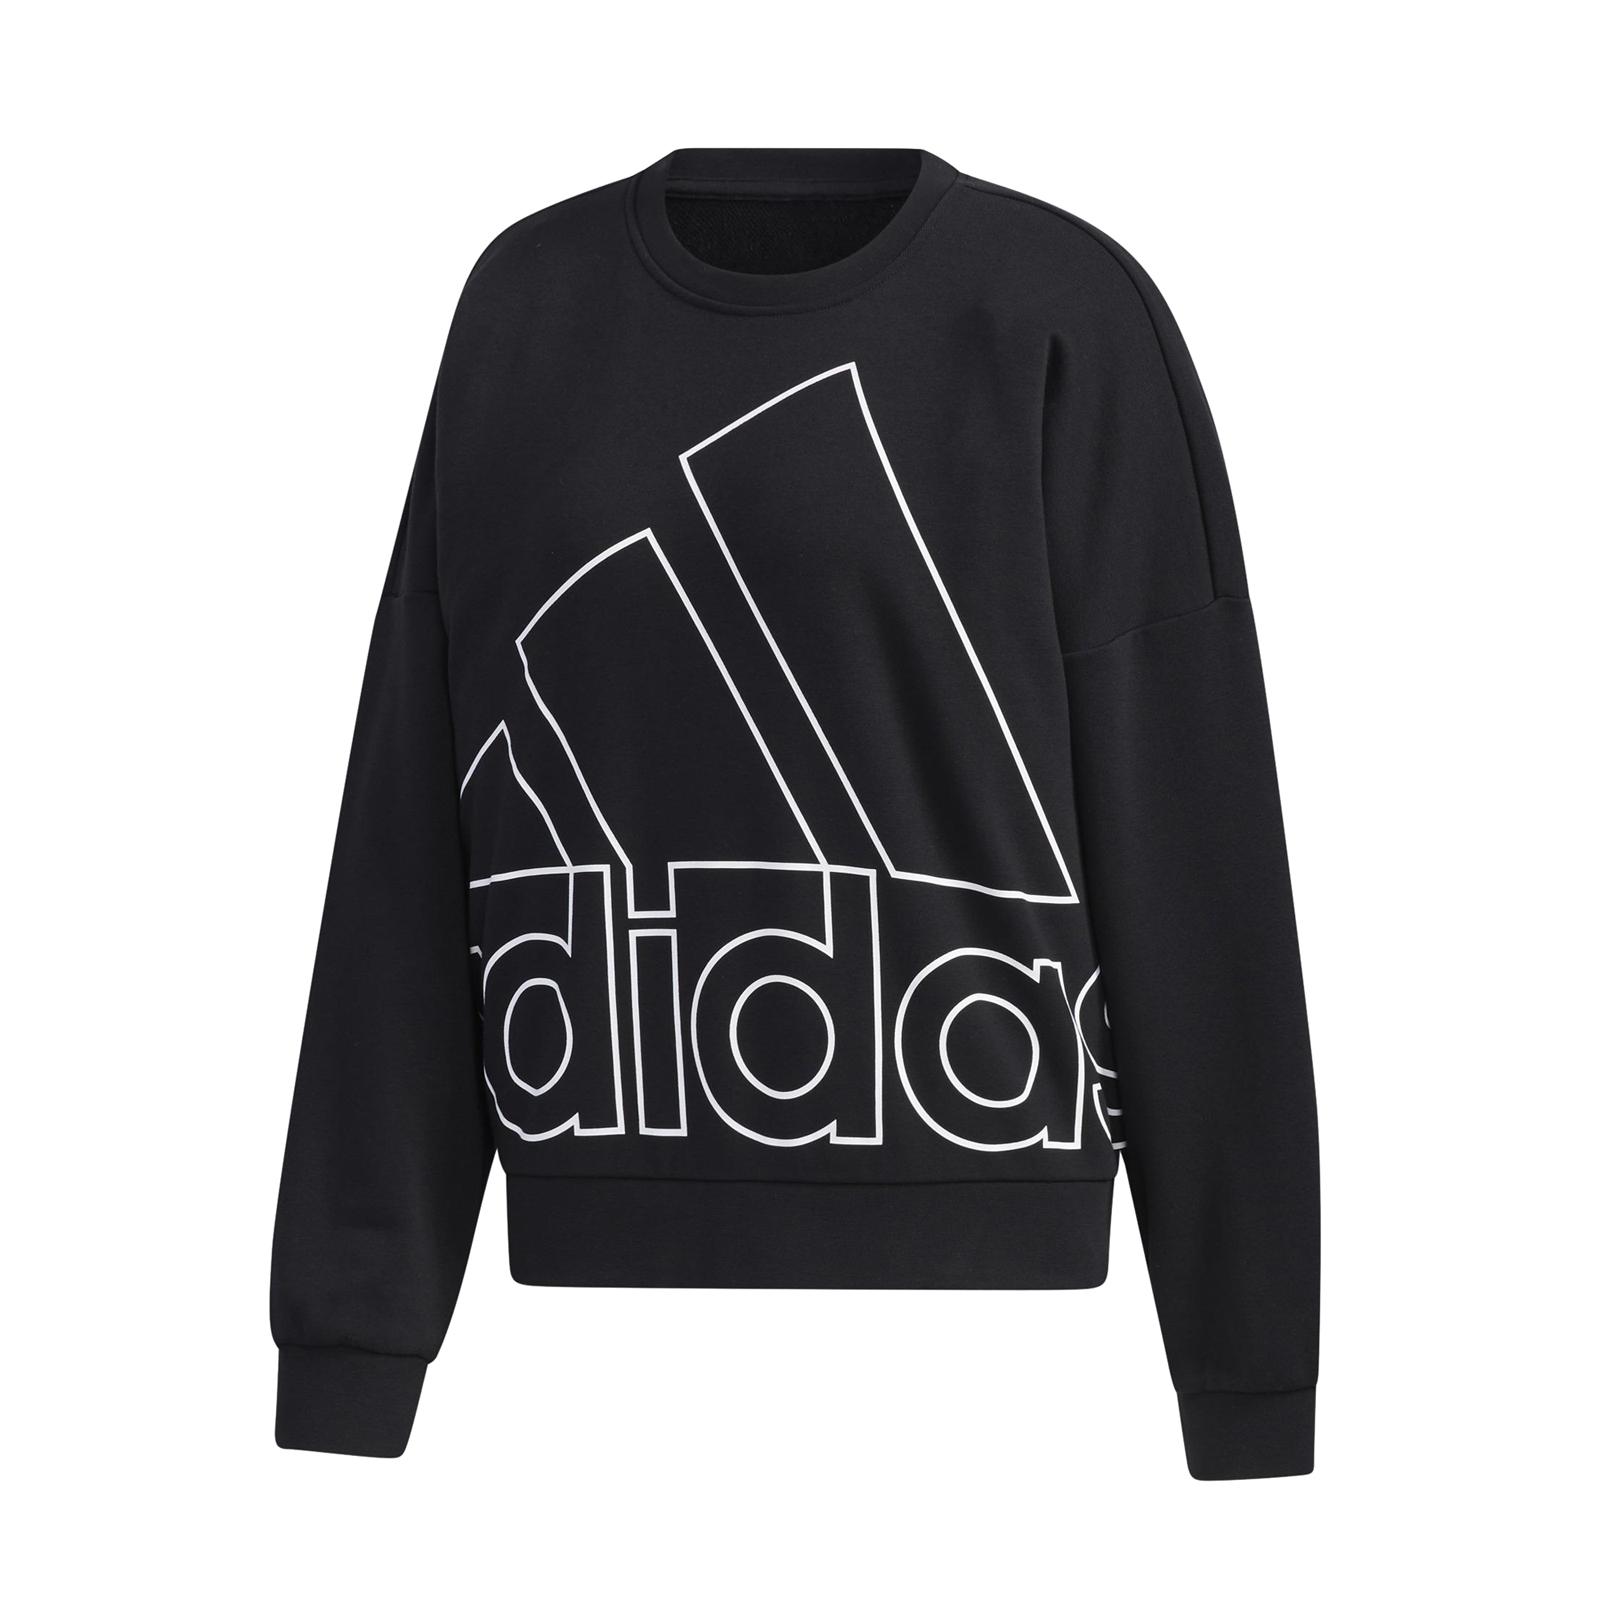 adidas 長袖上衣 Graphic Sweatshirt 黑 大Logo 大學TEE 女款 【ACS】 GK0614